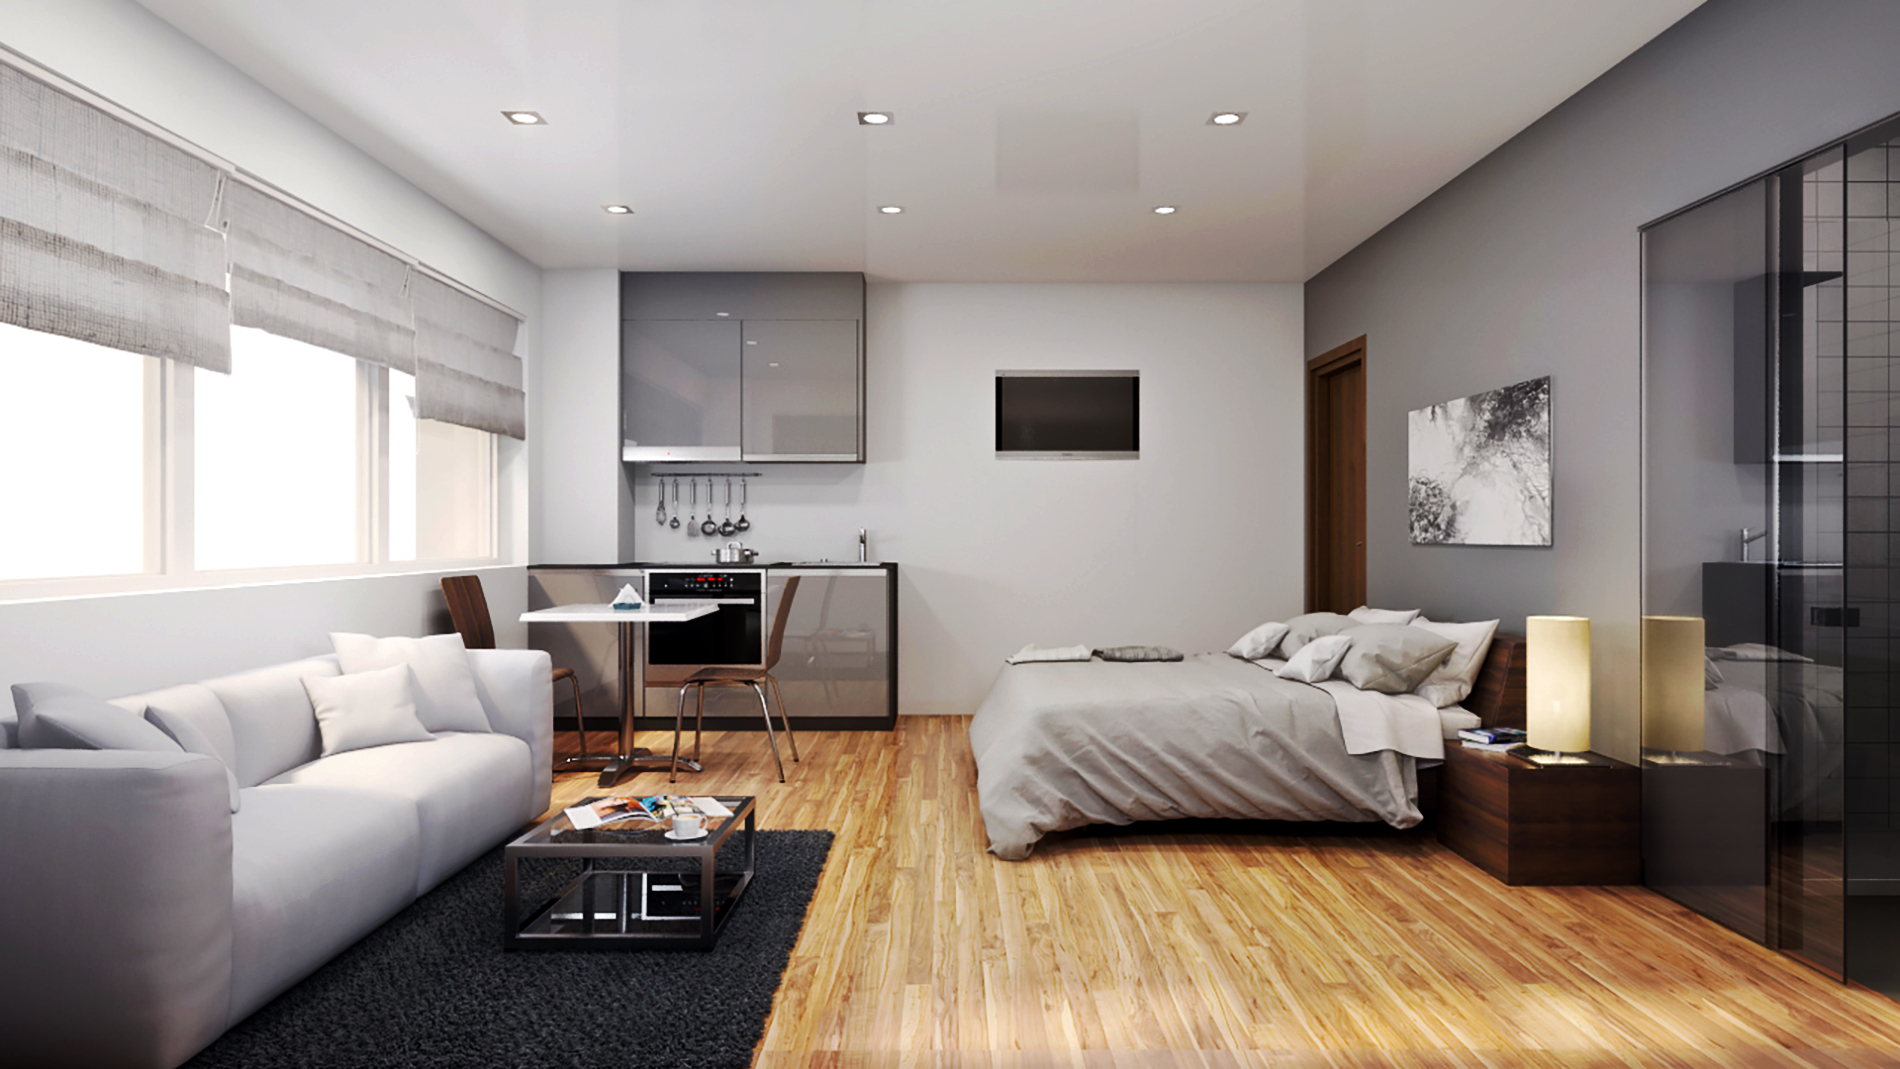 Keele House Dual Purpose Studio Apartments